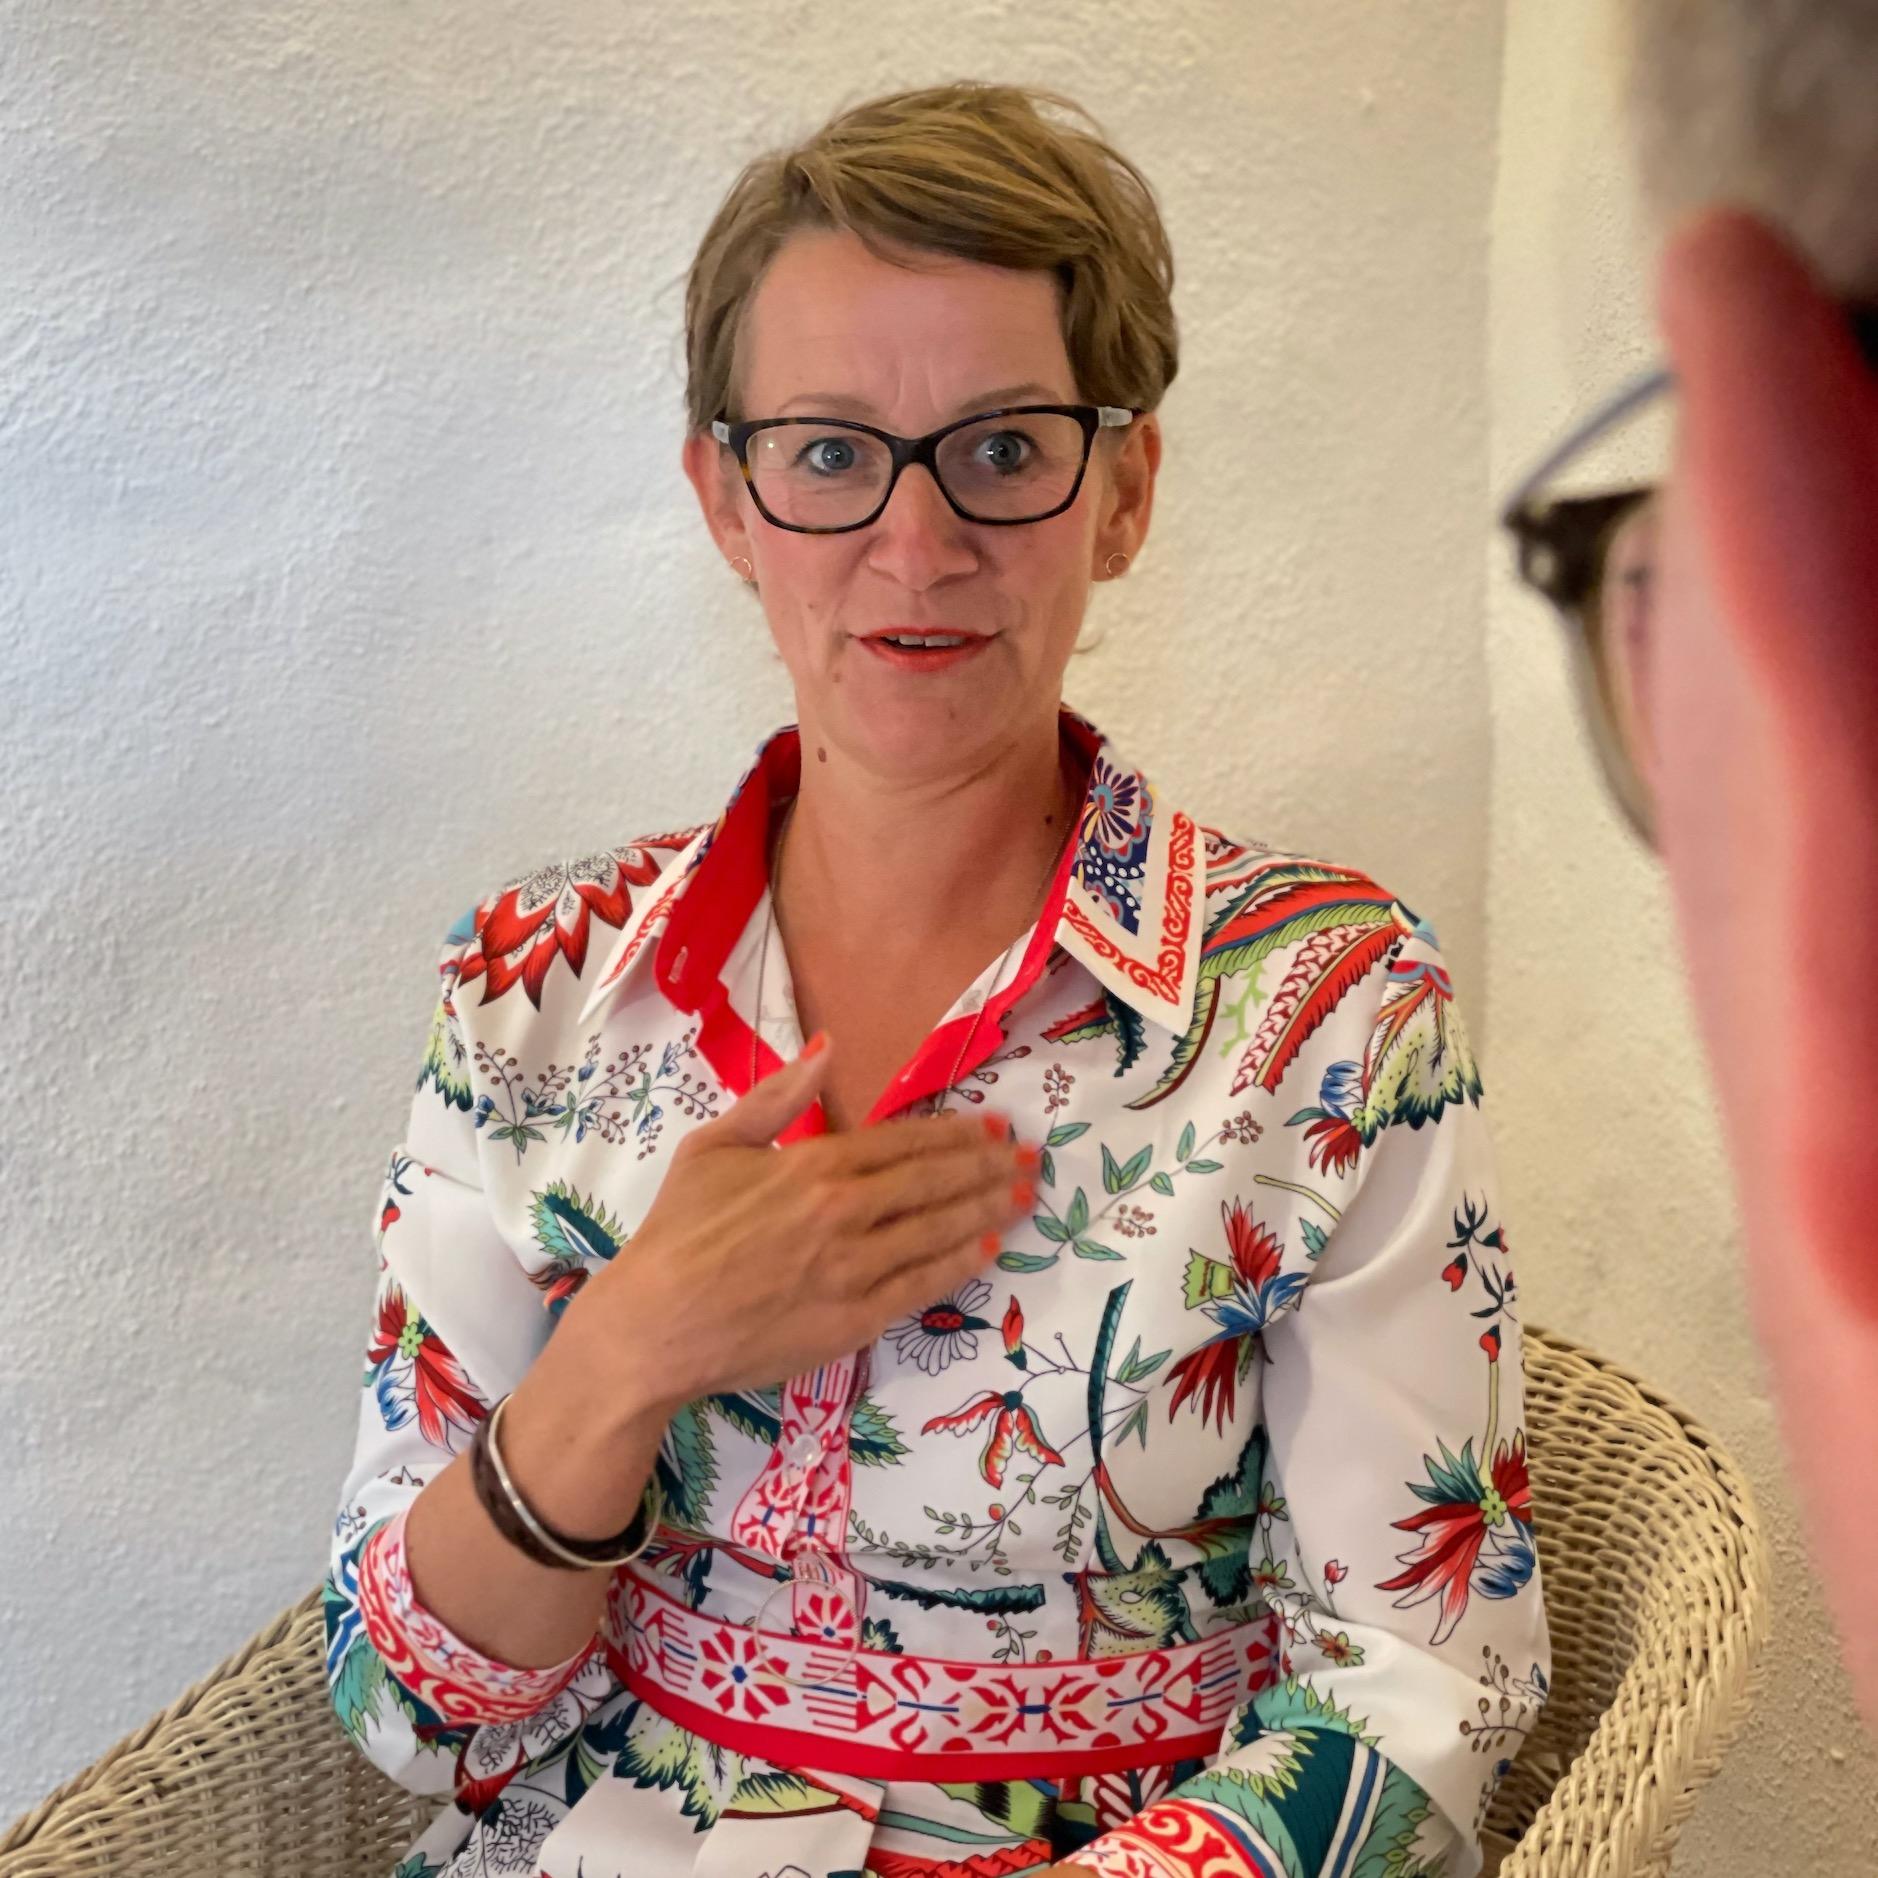 Andrea Nägel PEP Kurbeln